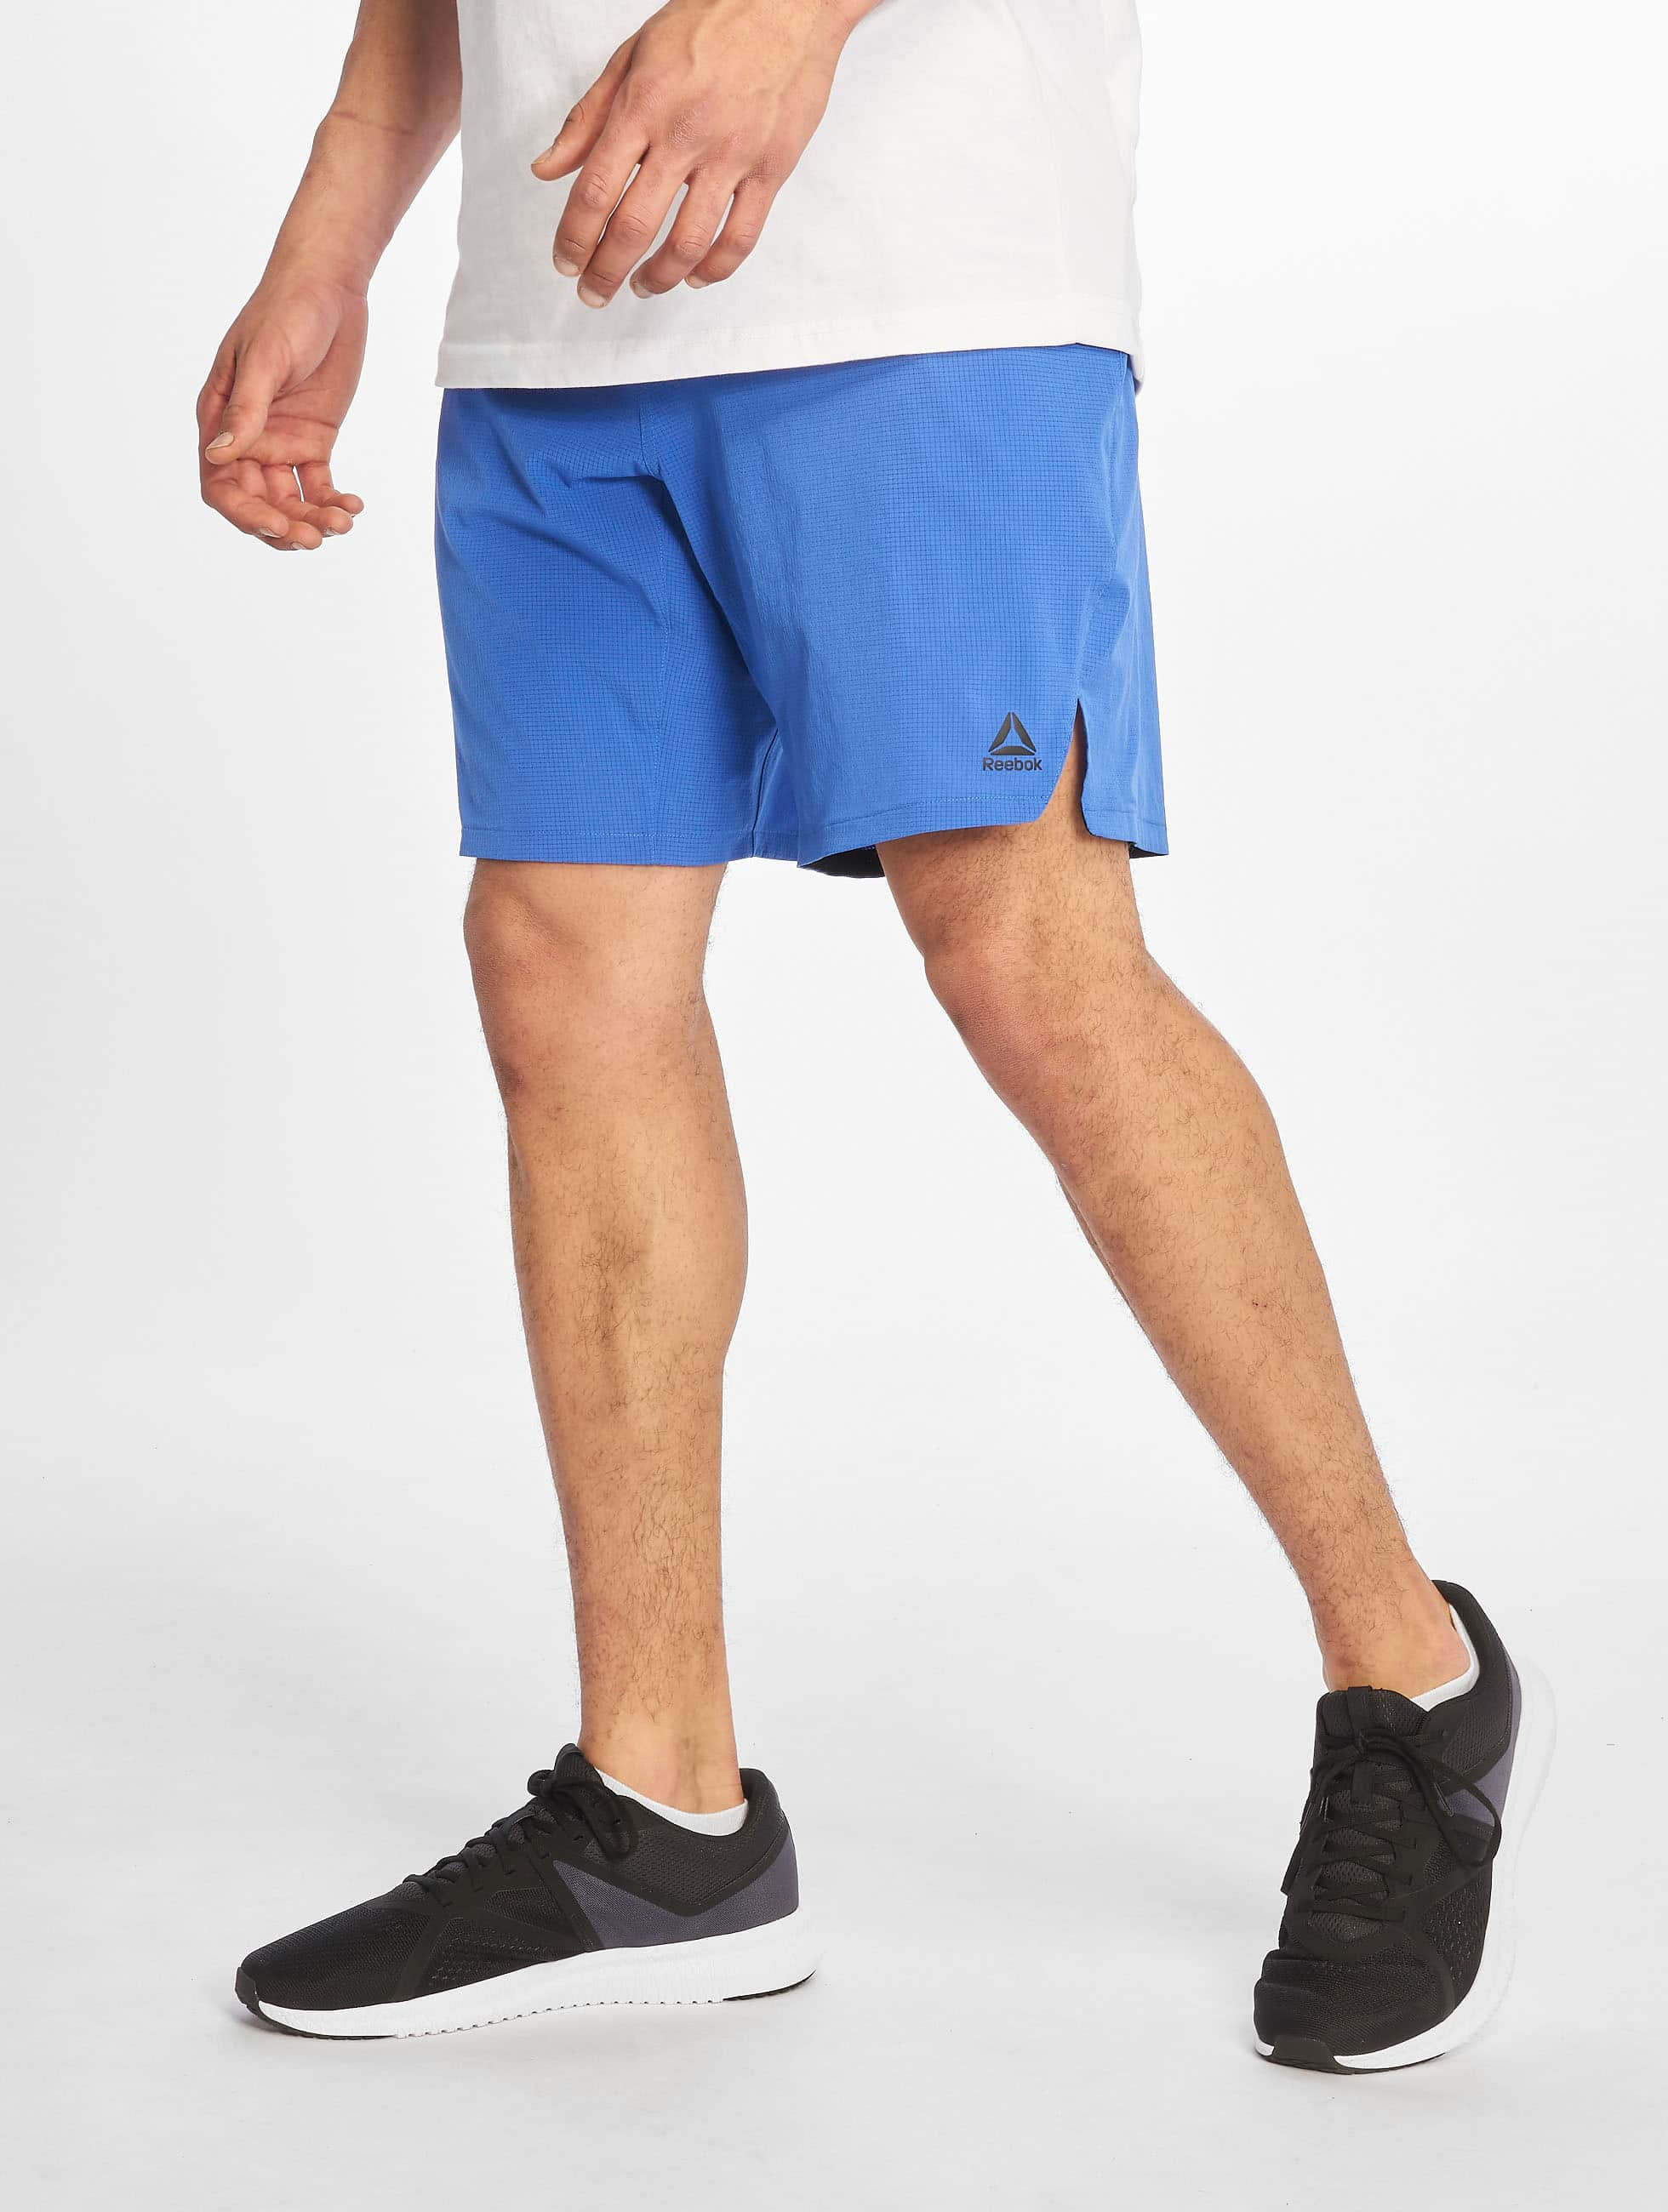 Reebok Ost Epic Knit Waist Shorts BlackWhiteTrue Grey